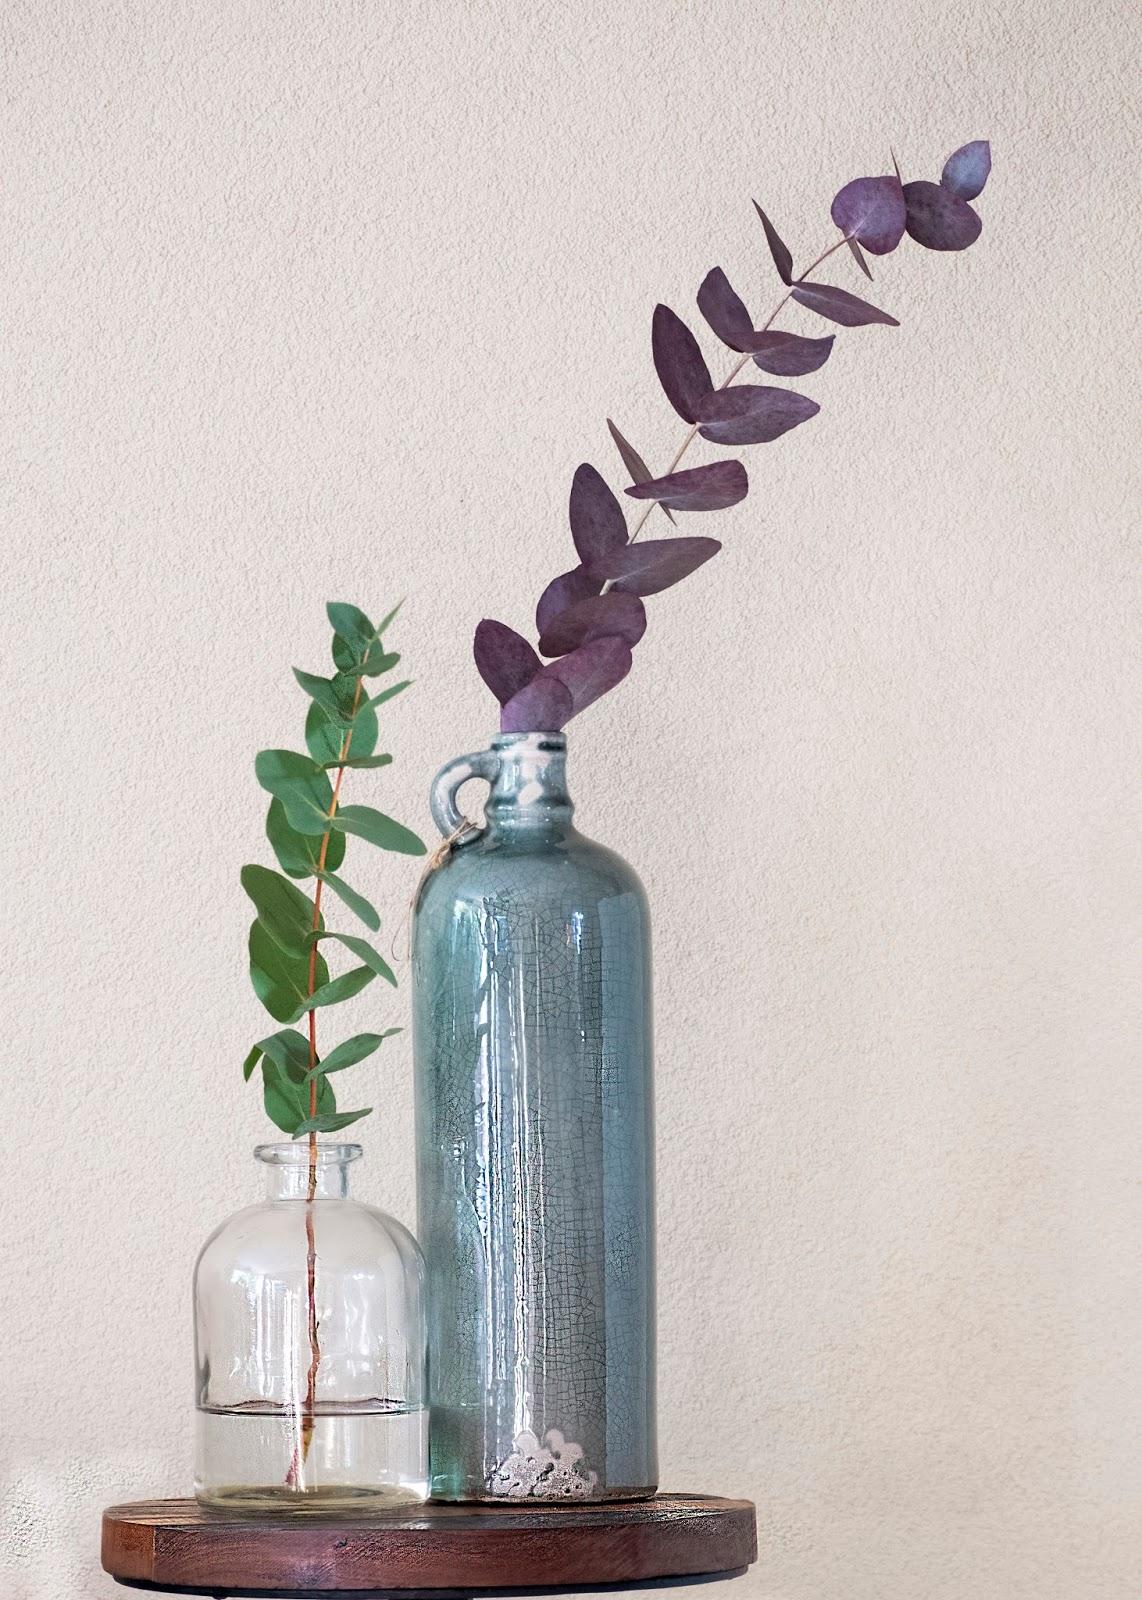 Eucalyptus op kleur brengen